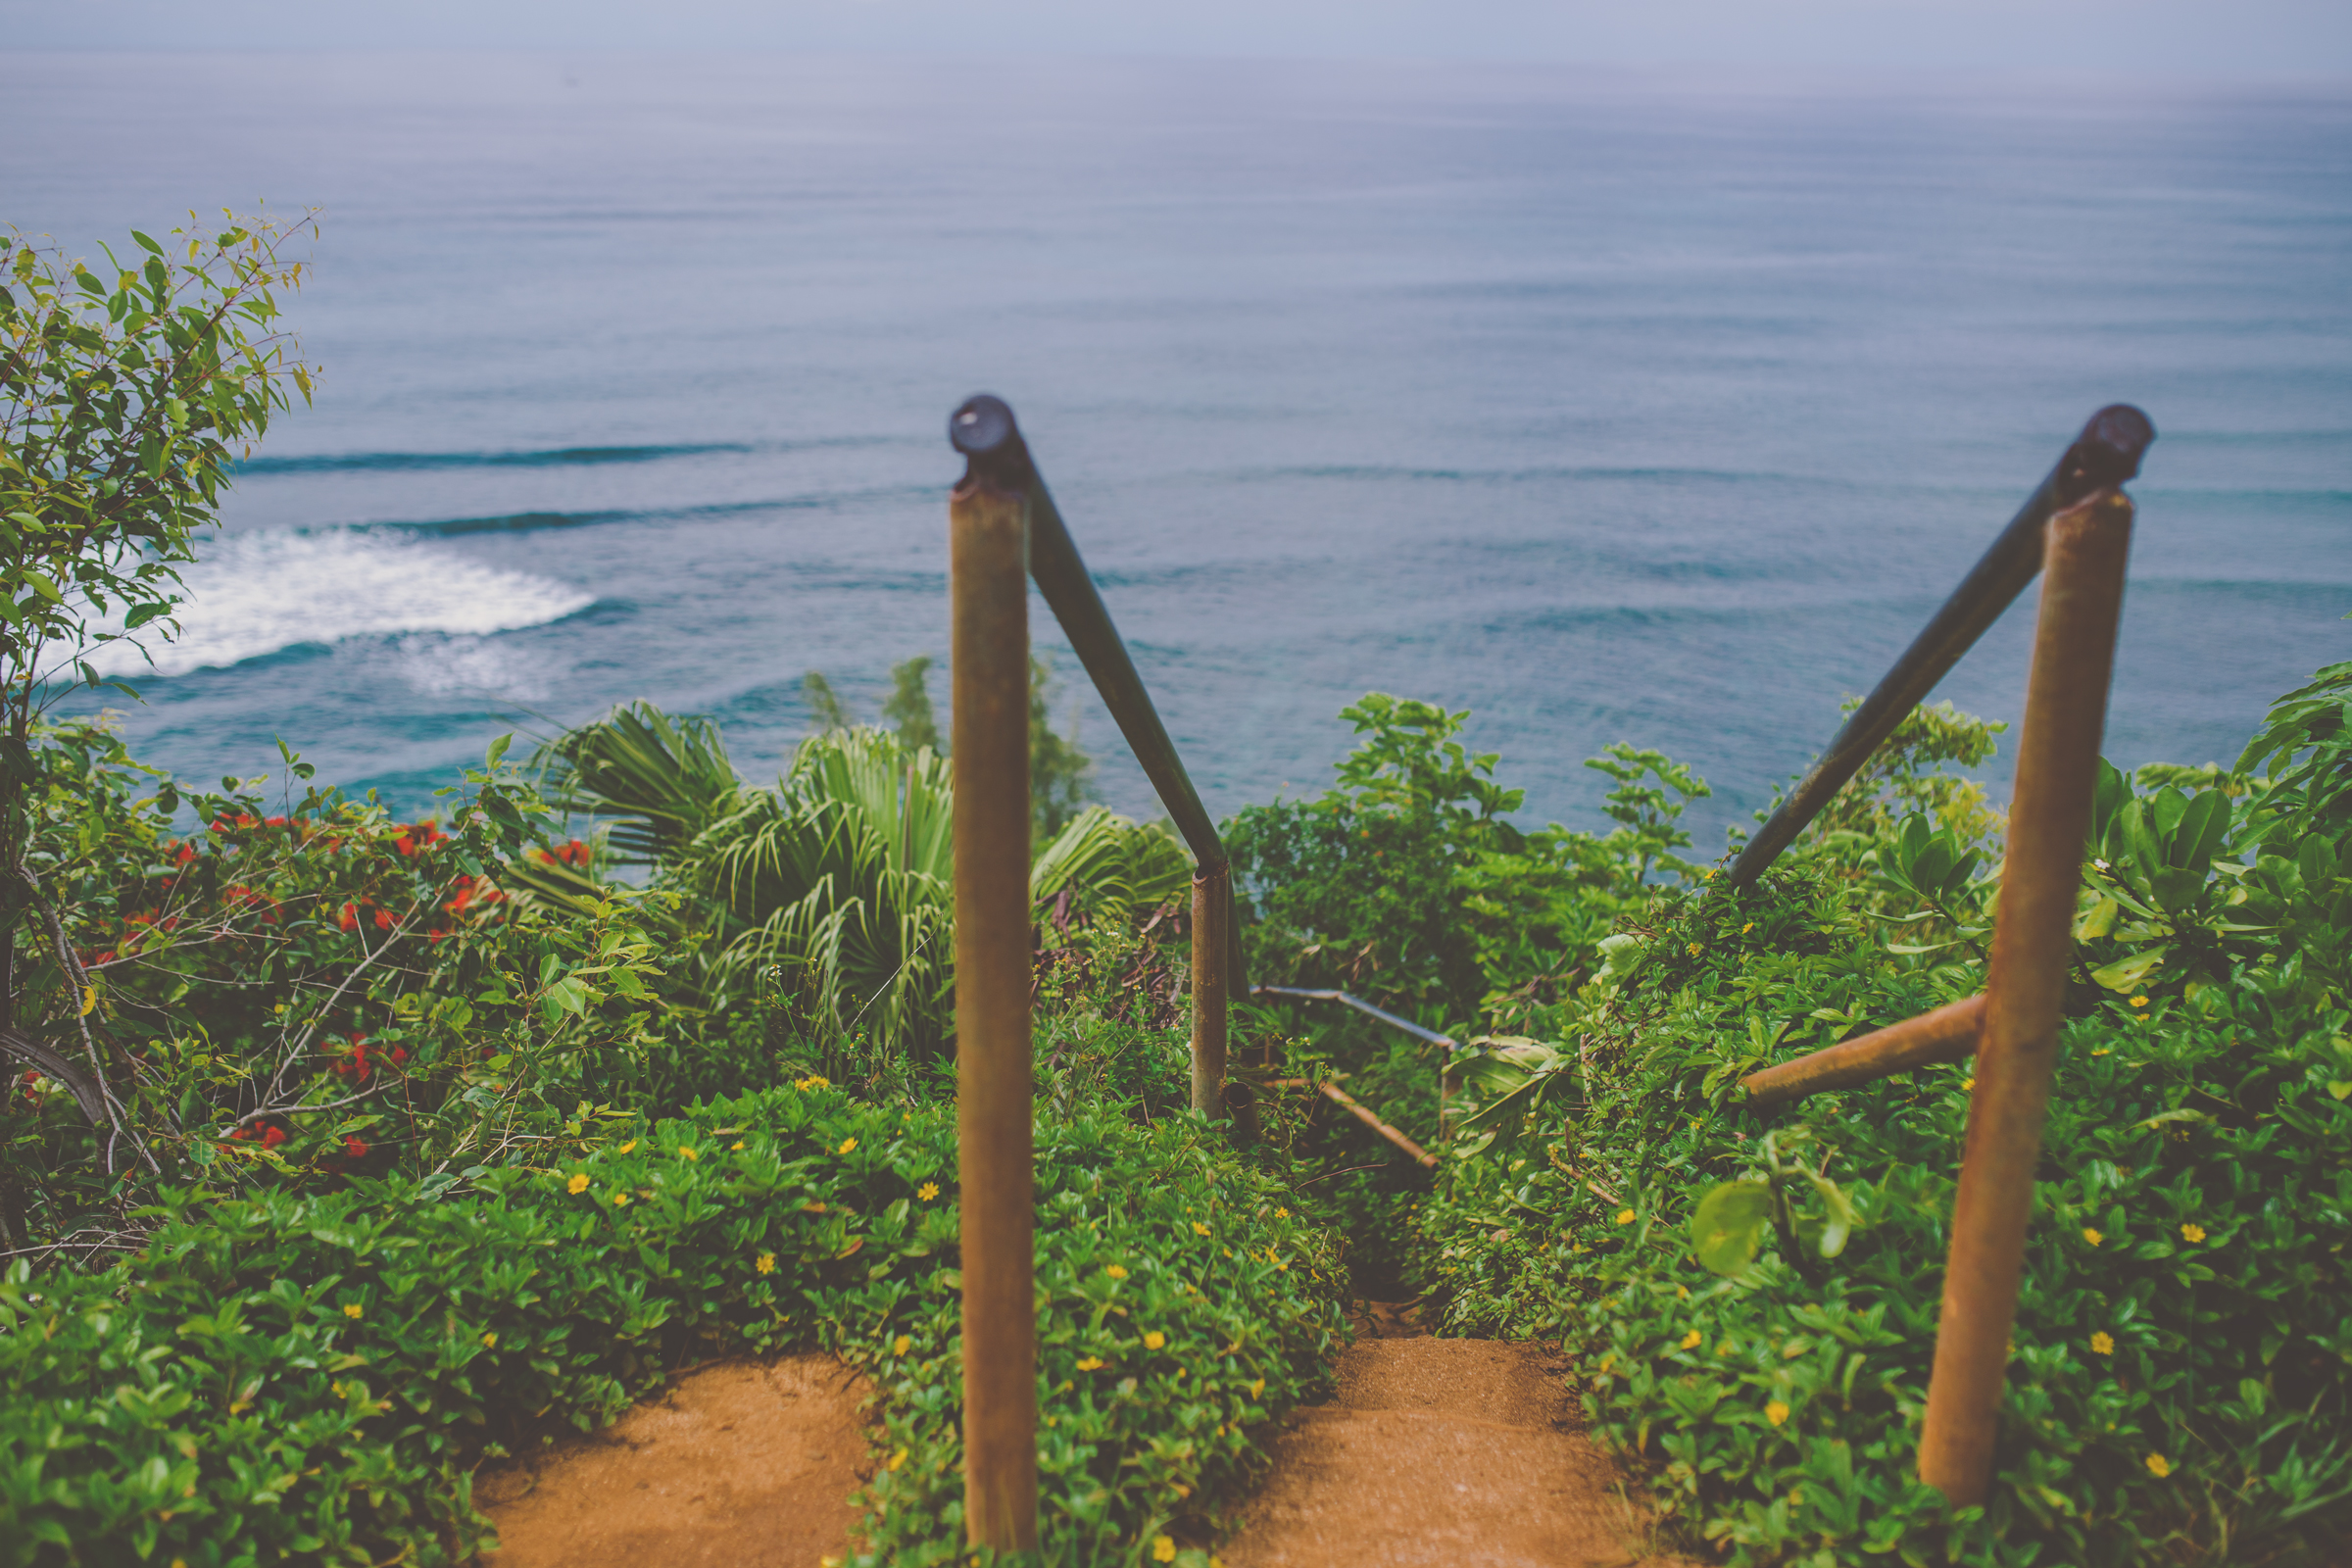 IMG_3341--KAUAI-HAWAII-JENNIFER-PICARD-PHOTOGRAPHY.jpg